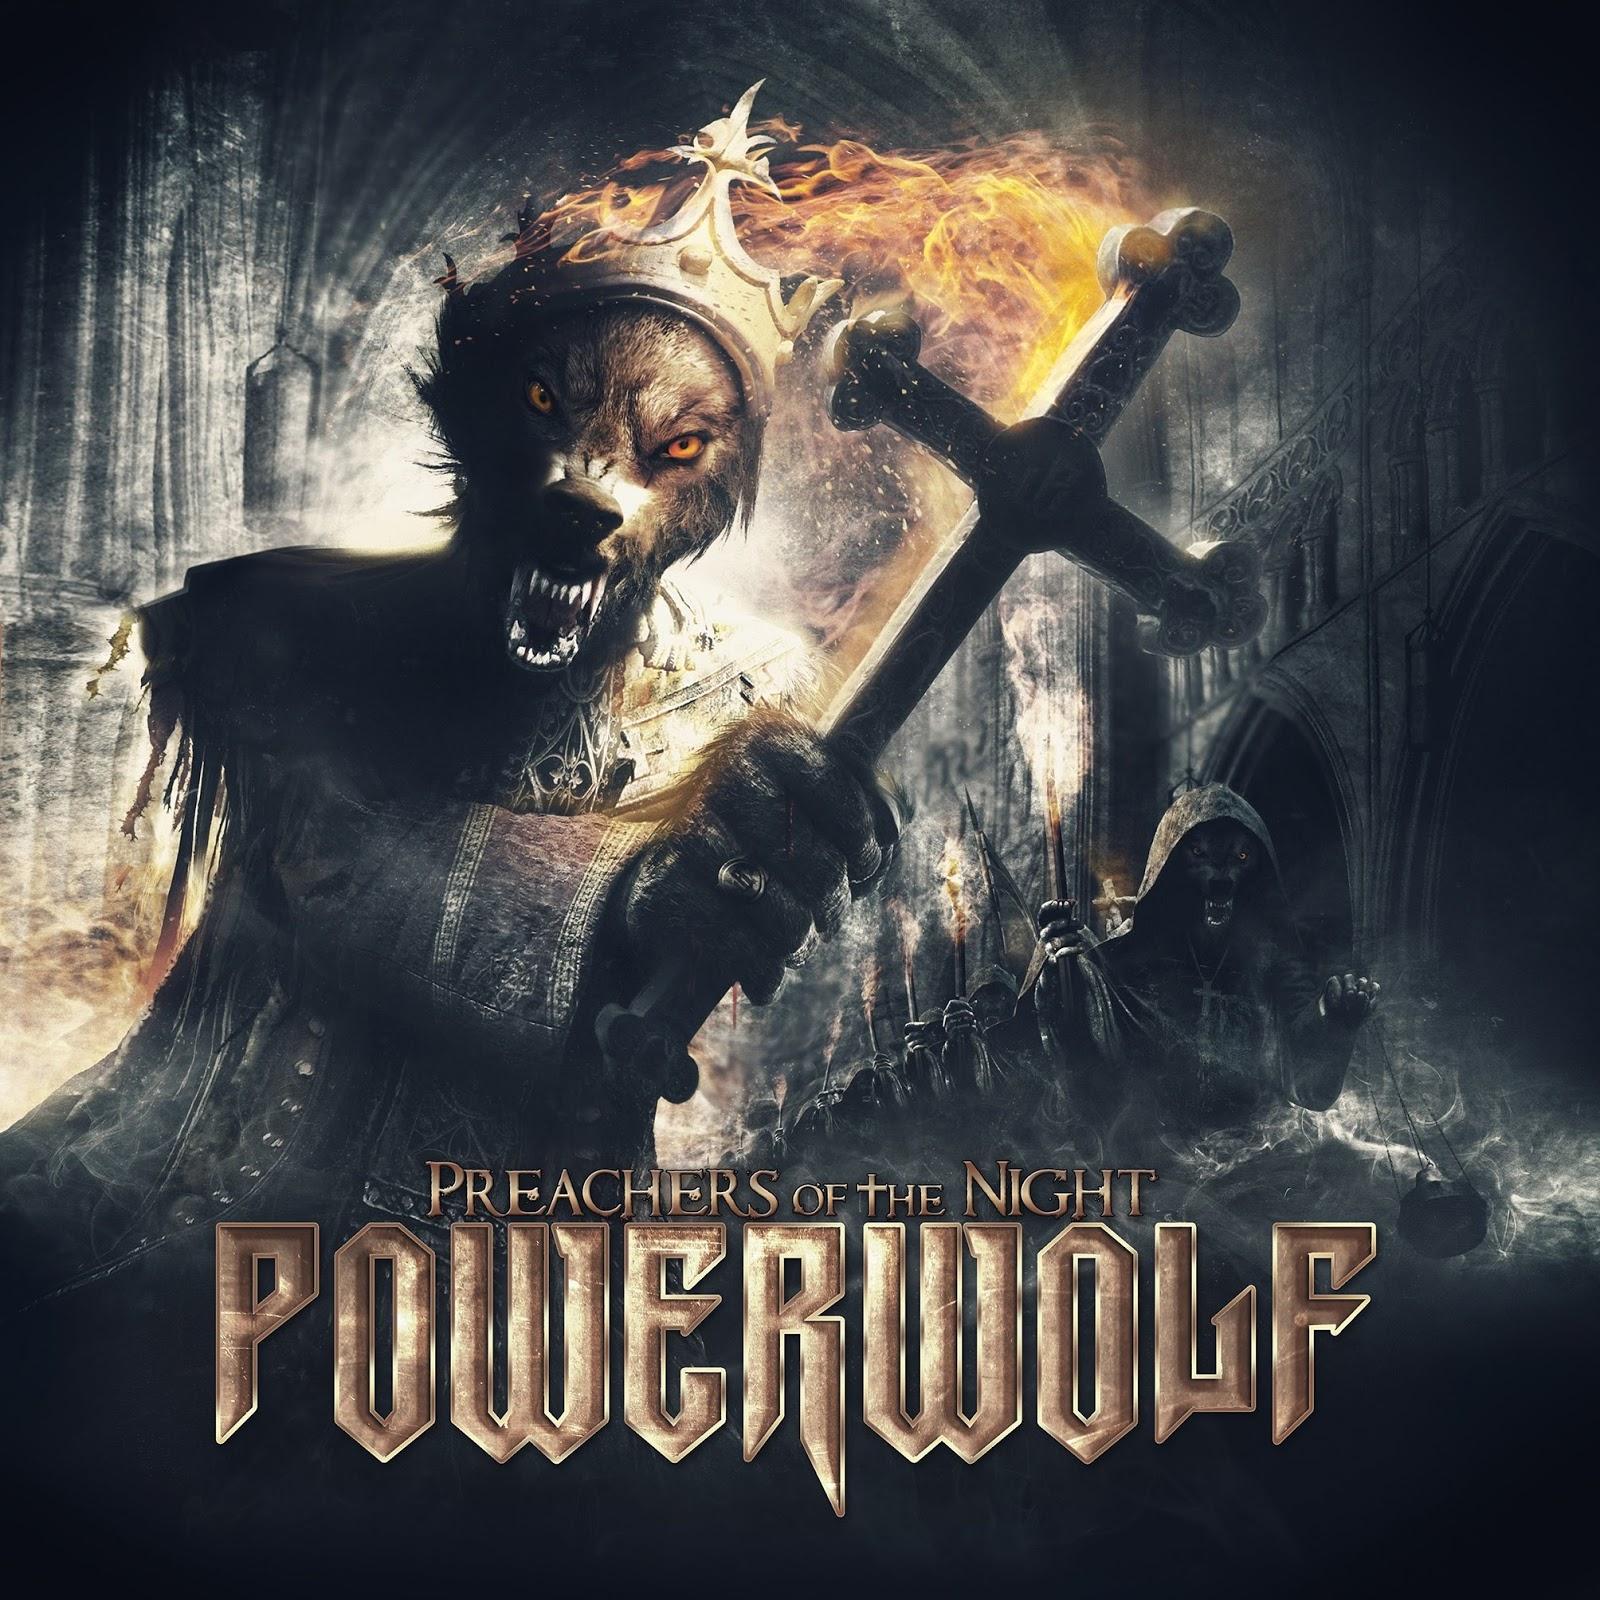 discografia completa de powerwolf